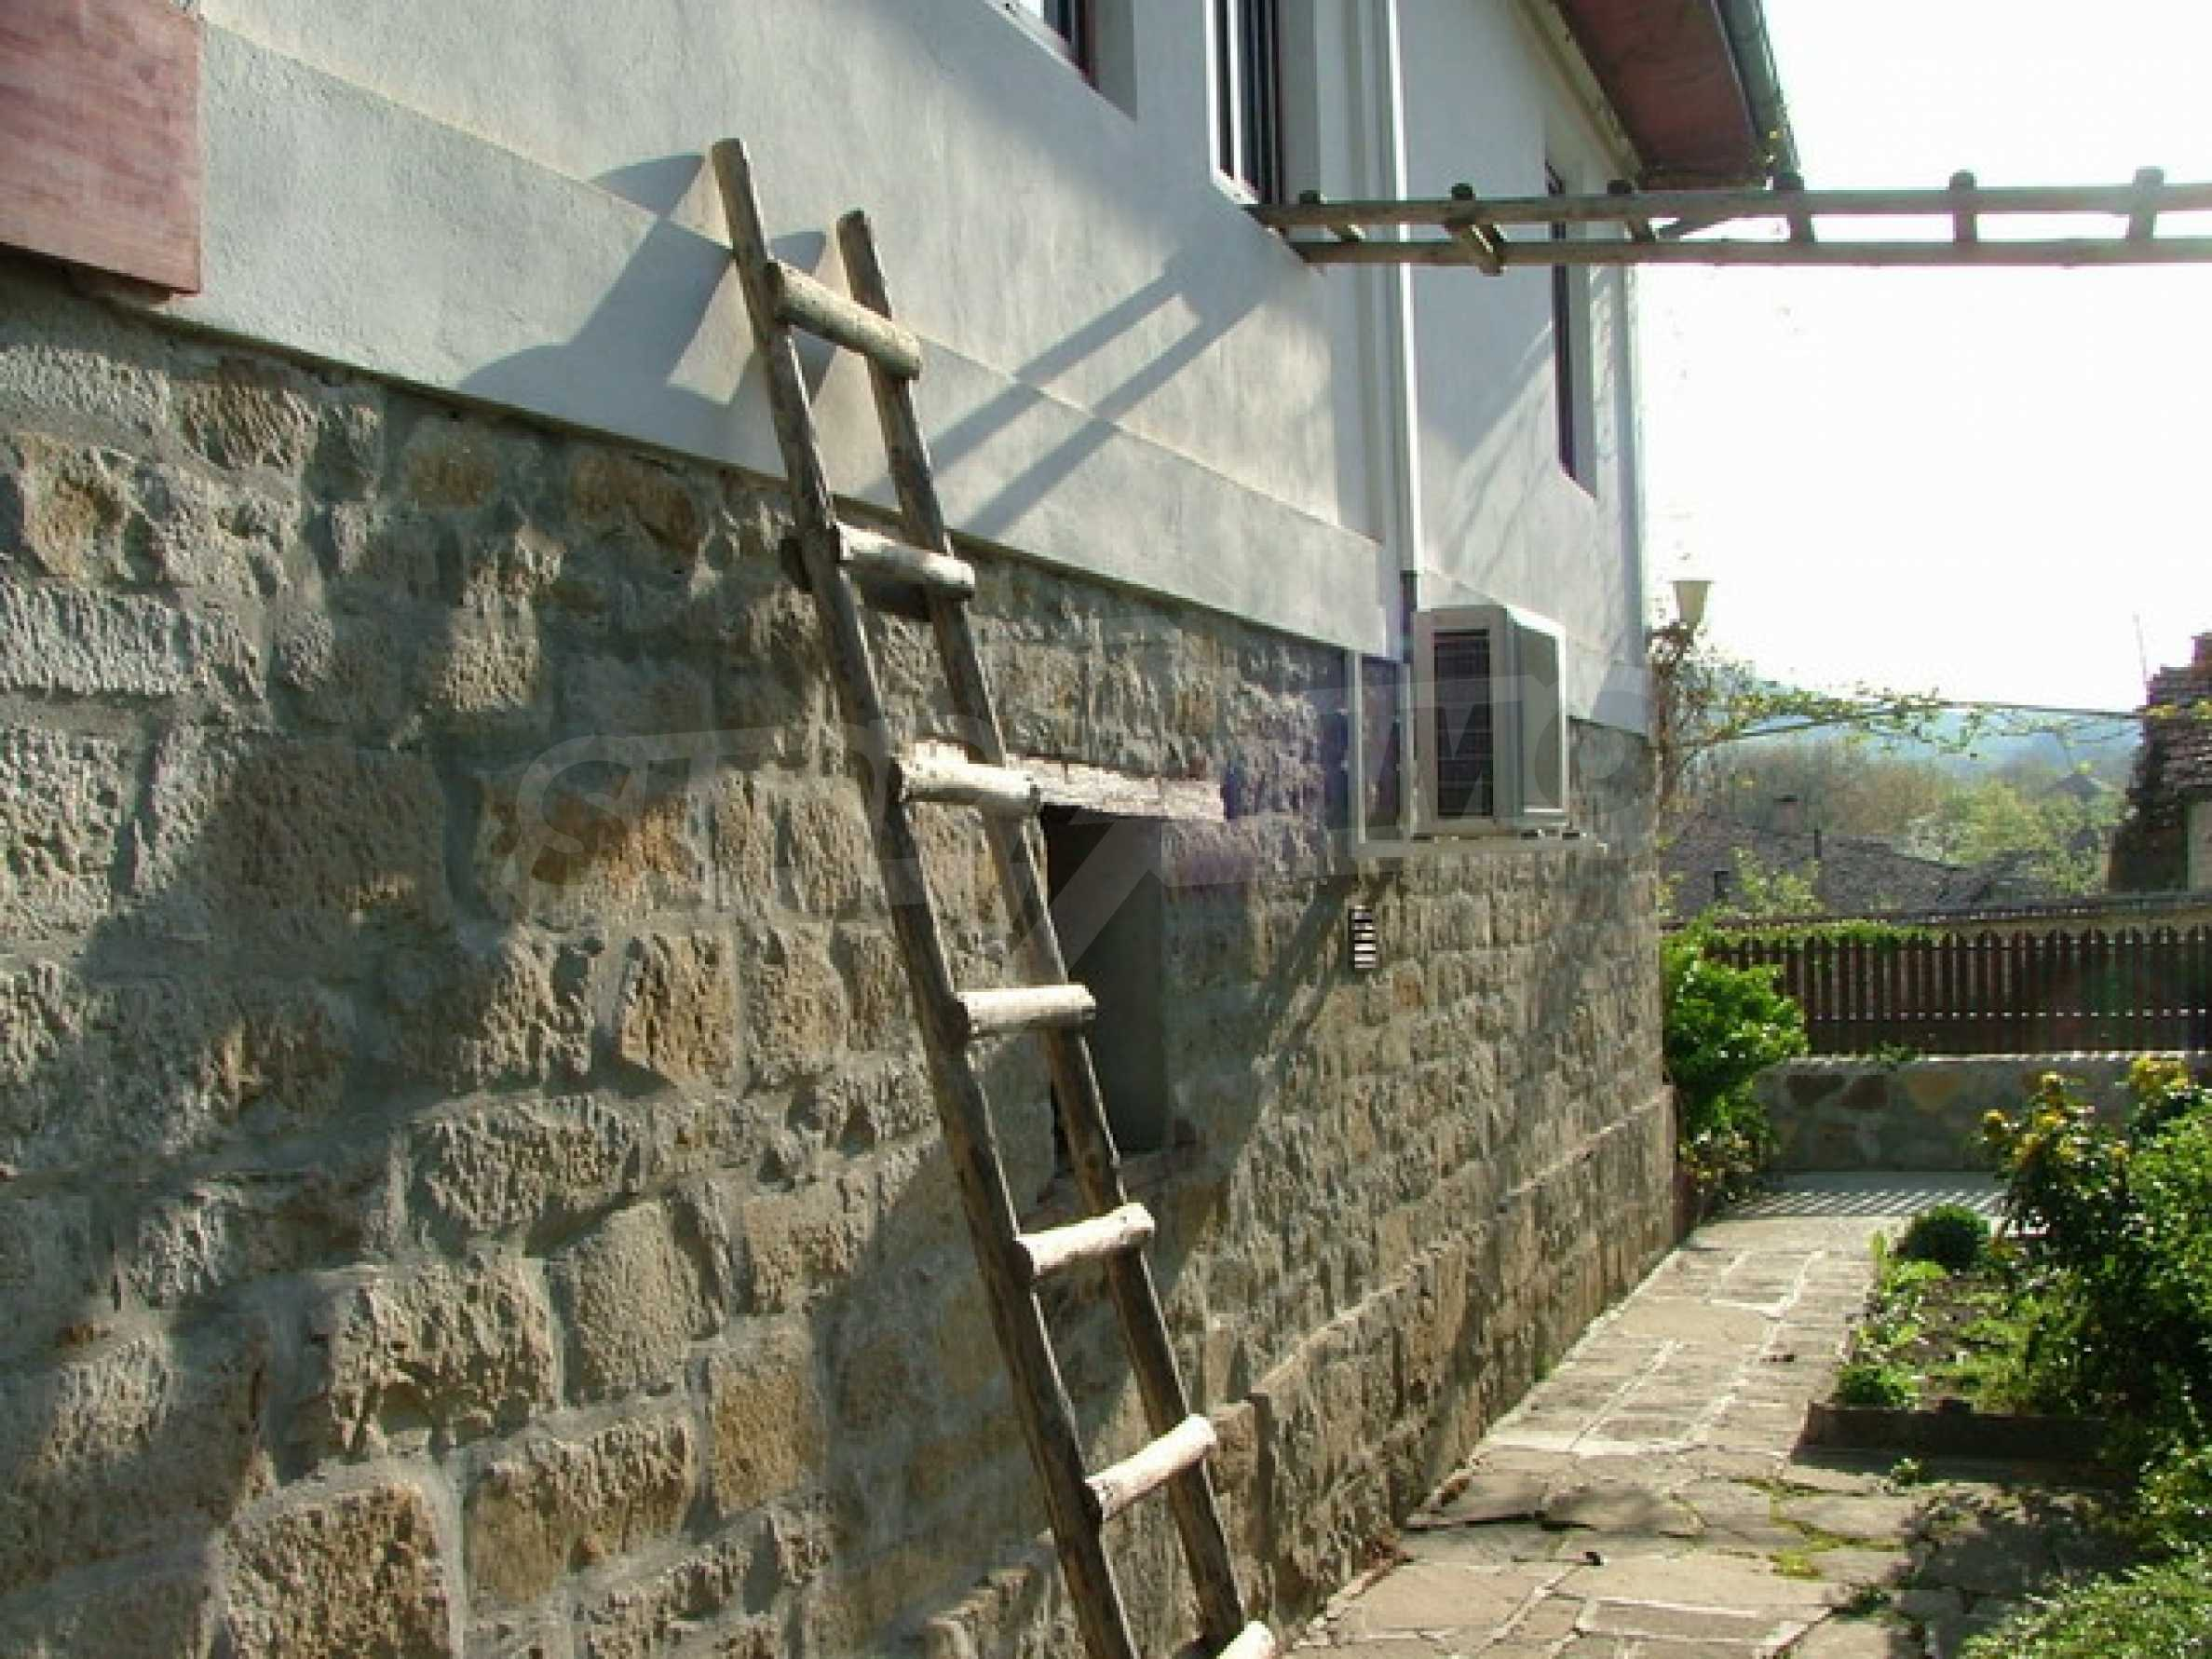 Stilvoll renovierte Villa 12 km entfernt. von Veliko Tarnovo 30